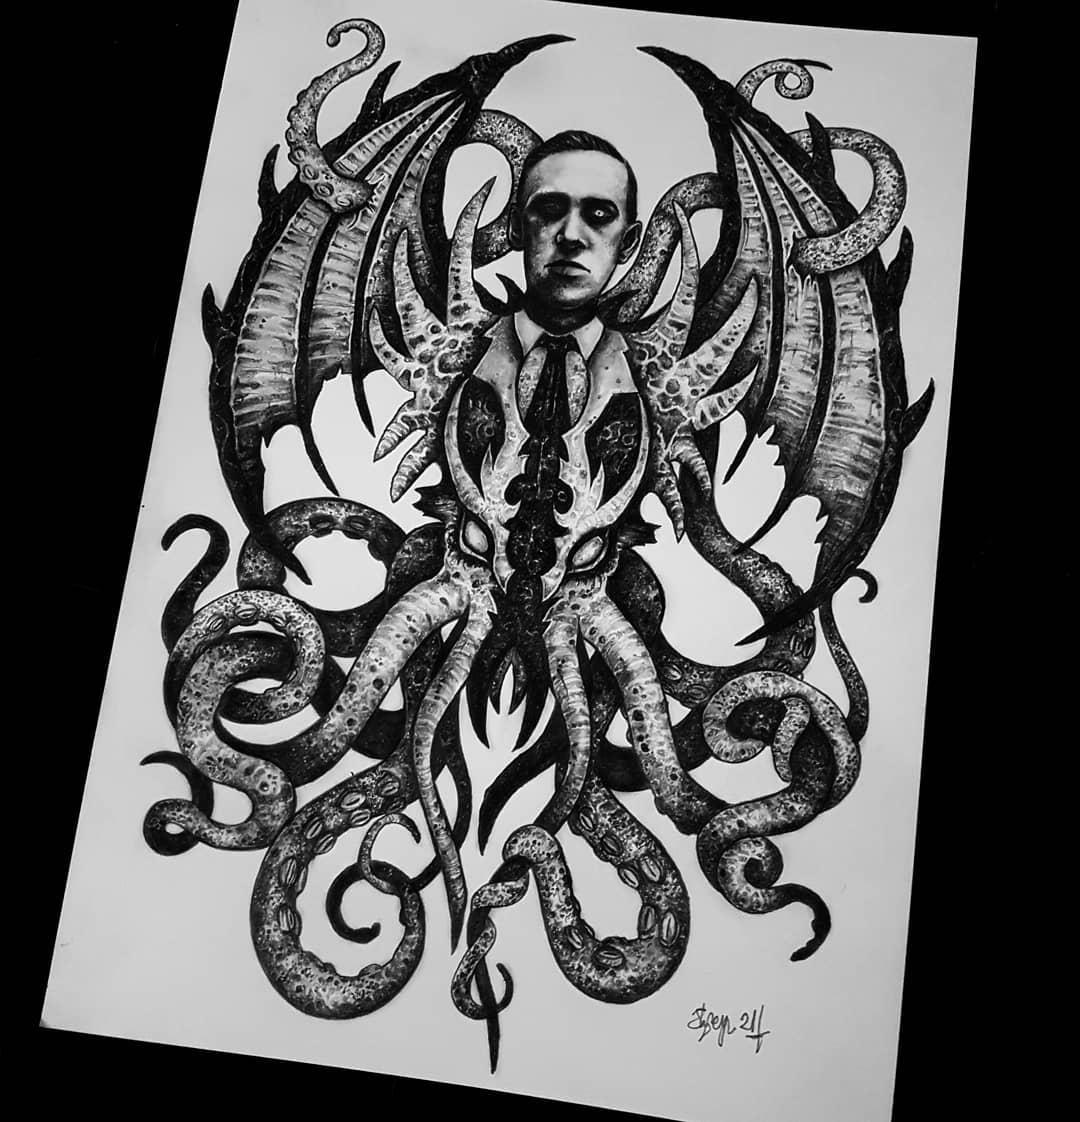 Lovecraft portrait 💀💀 after a few weeks of lockdown brain/art block, it feels amazing to draw again 🖤💪 . . . . . . . . . .                          artesobscurae occultarcana thedarkestwork onlythedarkest black_tattoo_culture darkartists wiccac